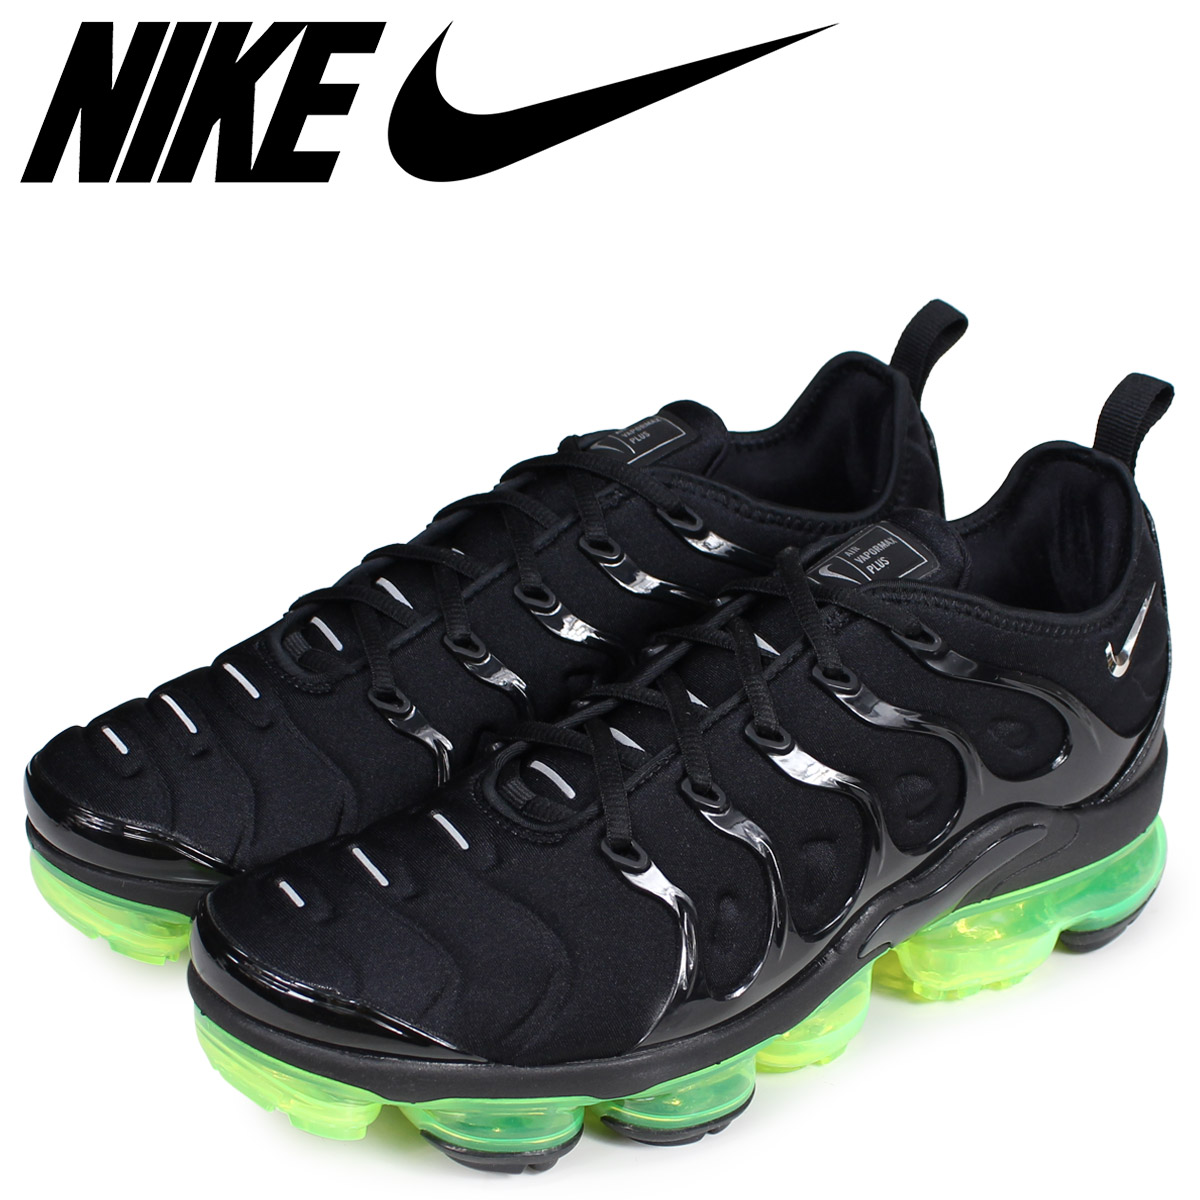 7c97db887ed NIKE Nike vapor max plus sneakers men AIR VAPORMAX PLUS black 924